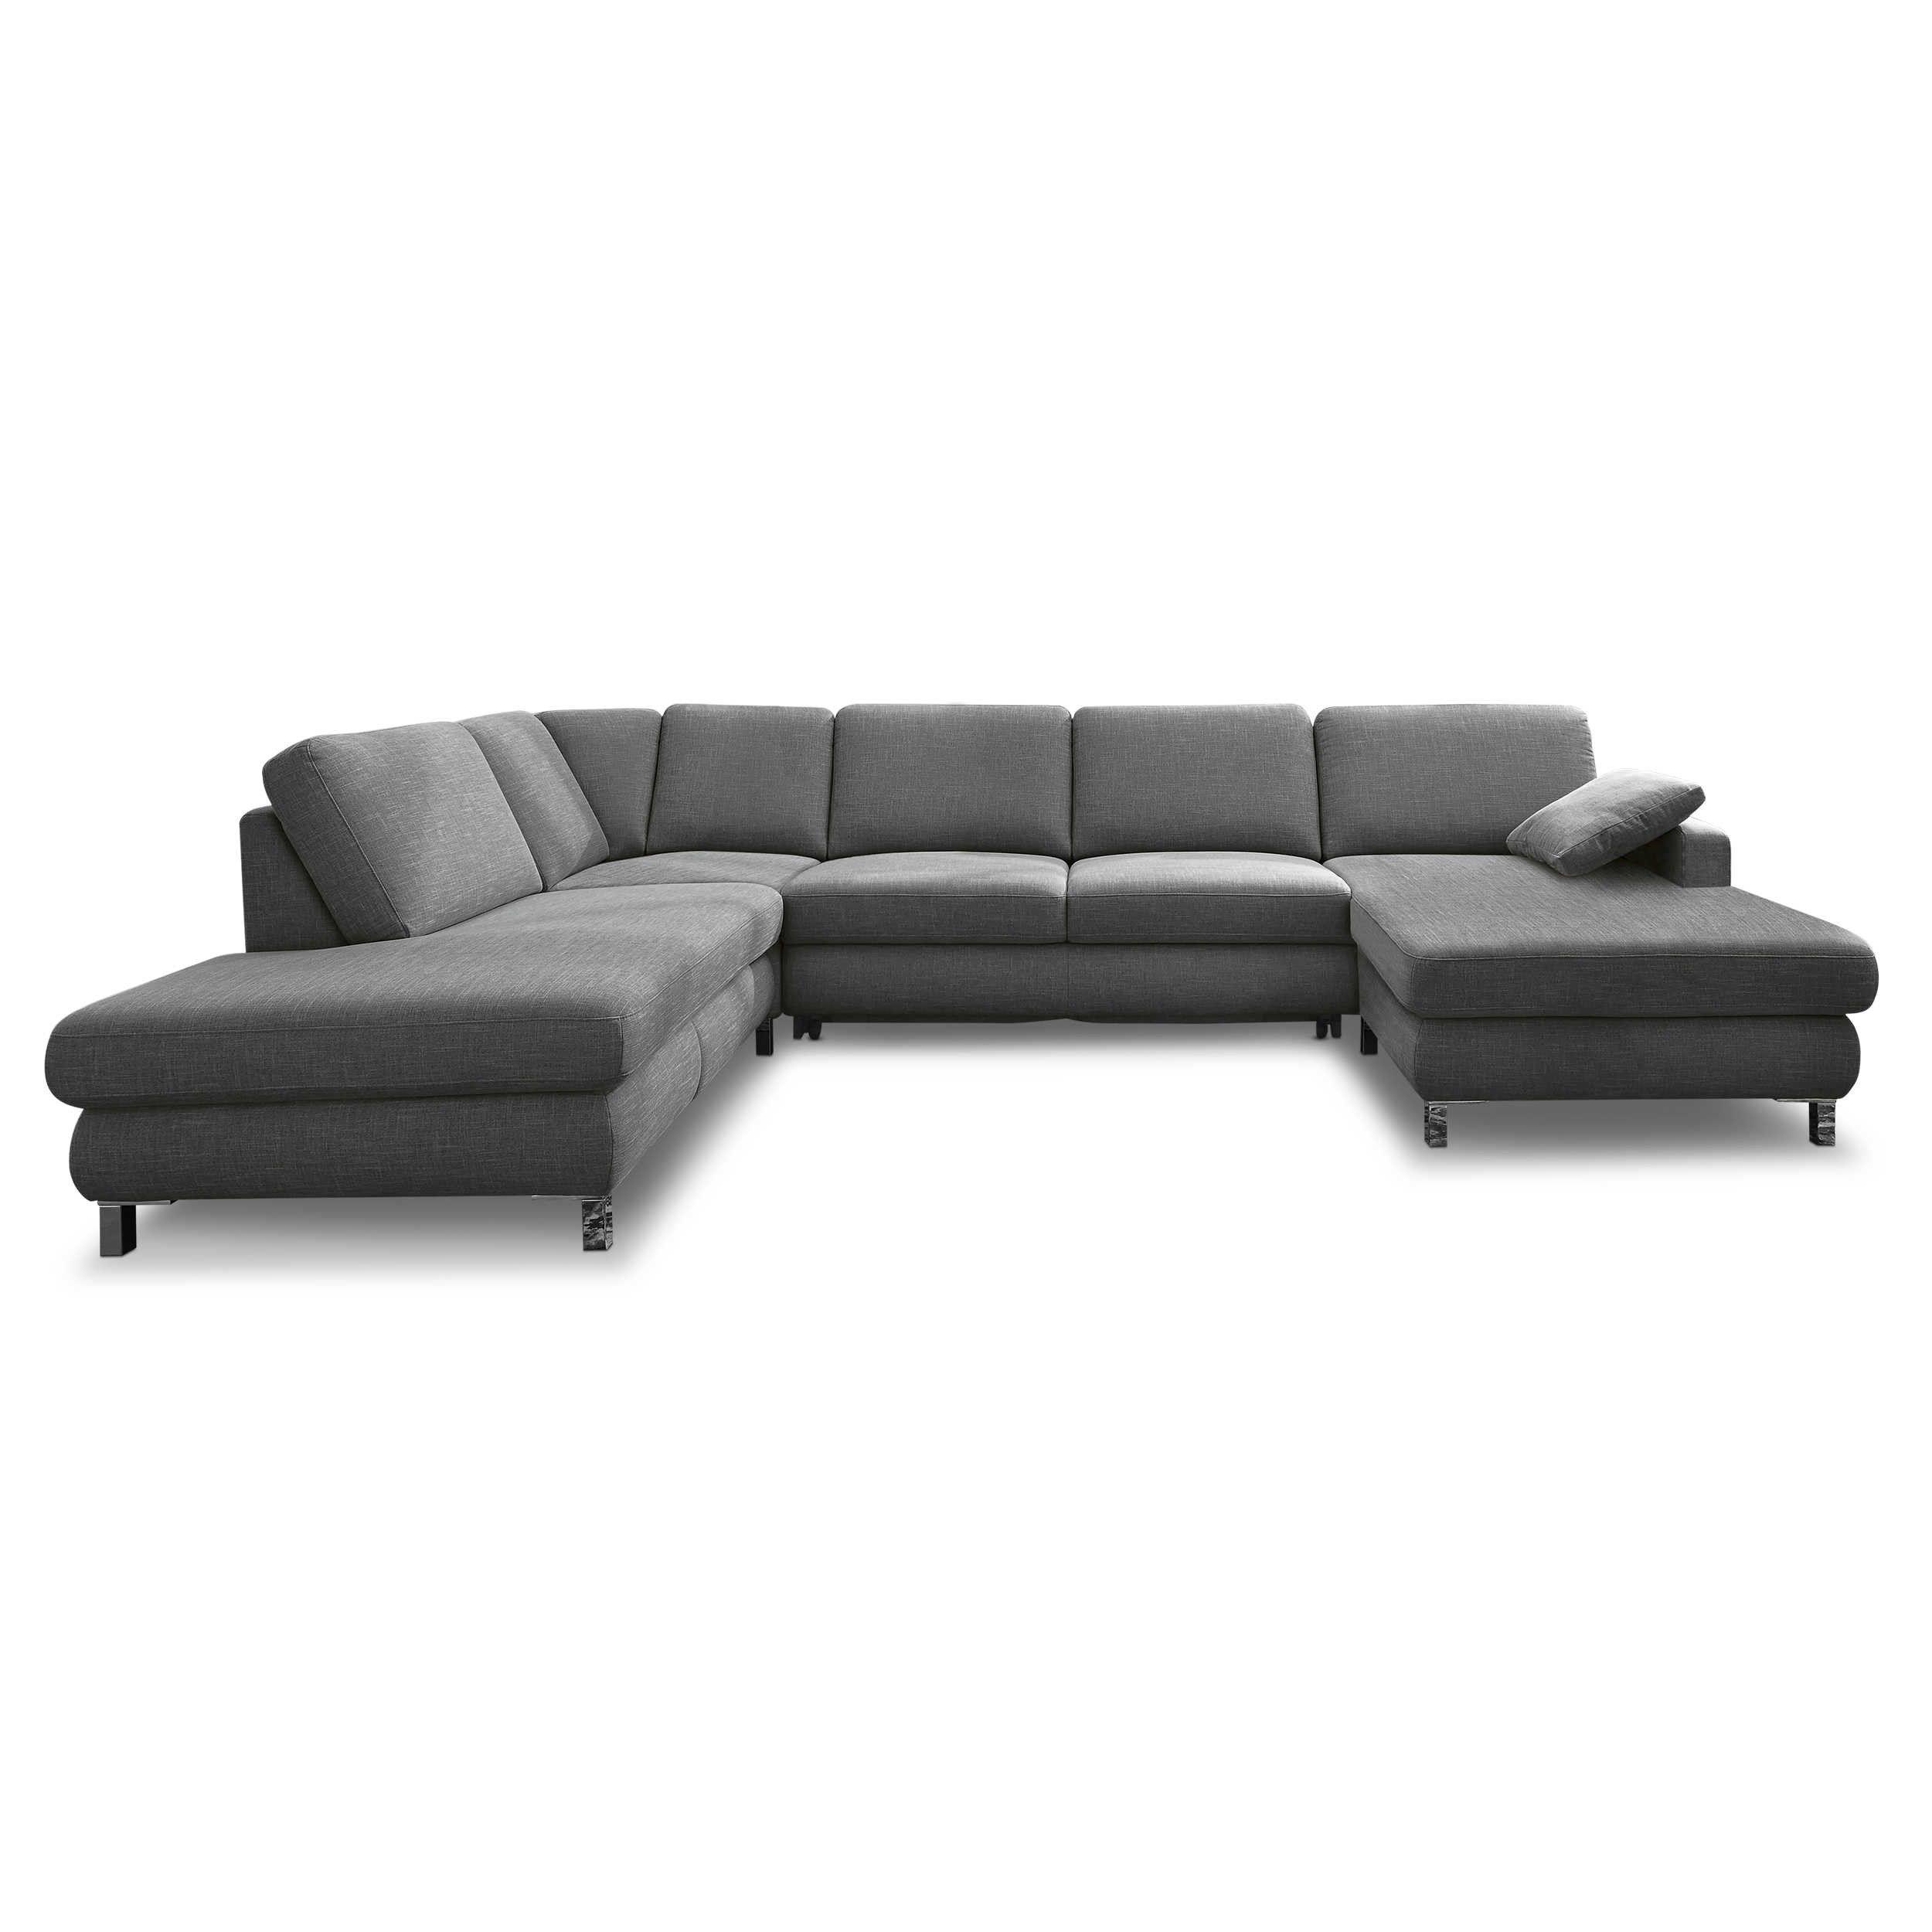 Couch Chesterfield Braun 3 Sitzer Sofa Abgesteppt Gepolstert Jetzt